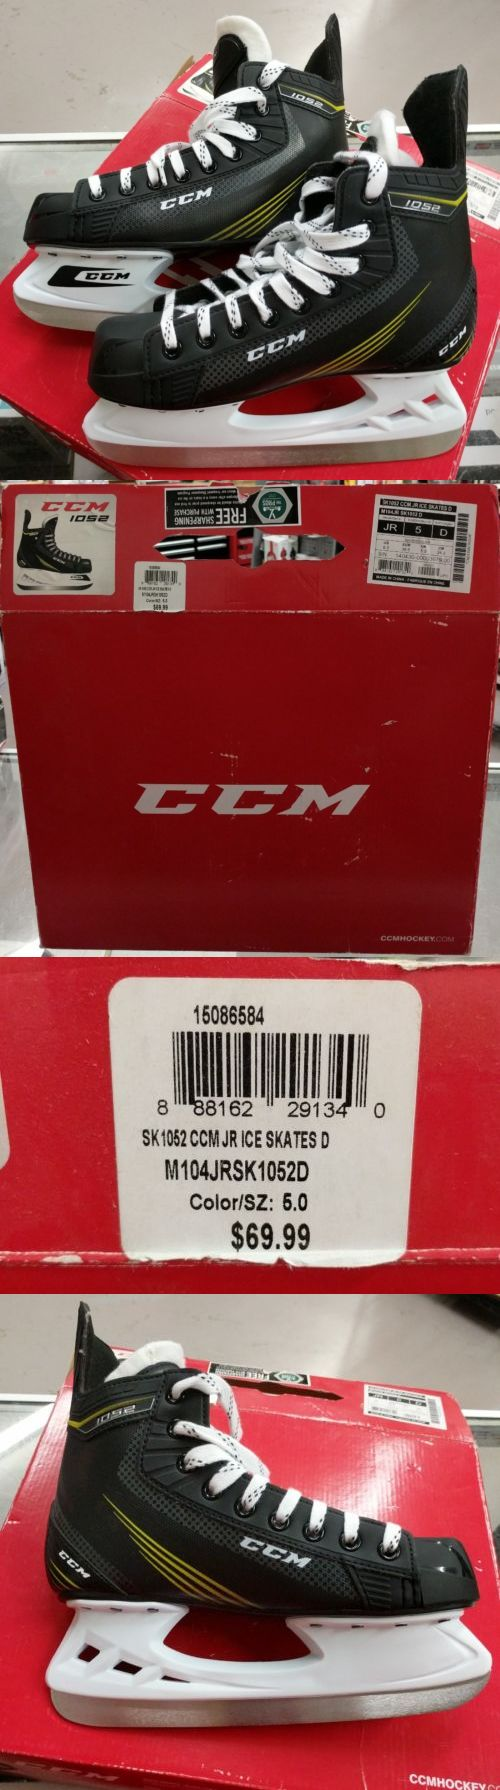 Ice Hockey-Adult 20858: Ccm Tacks 1052 Ice Skate - Junior 5 -> BUY IT NOW ONLY: $42.99 on eBay!